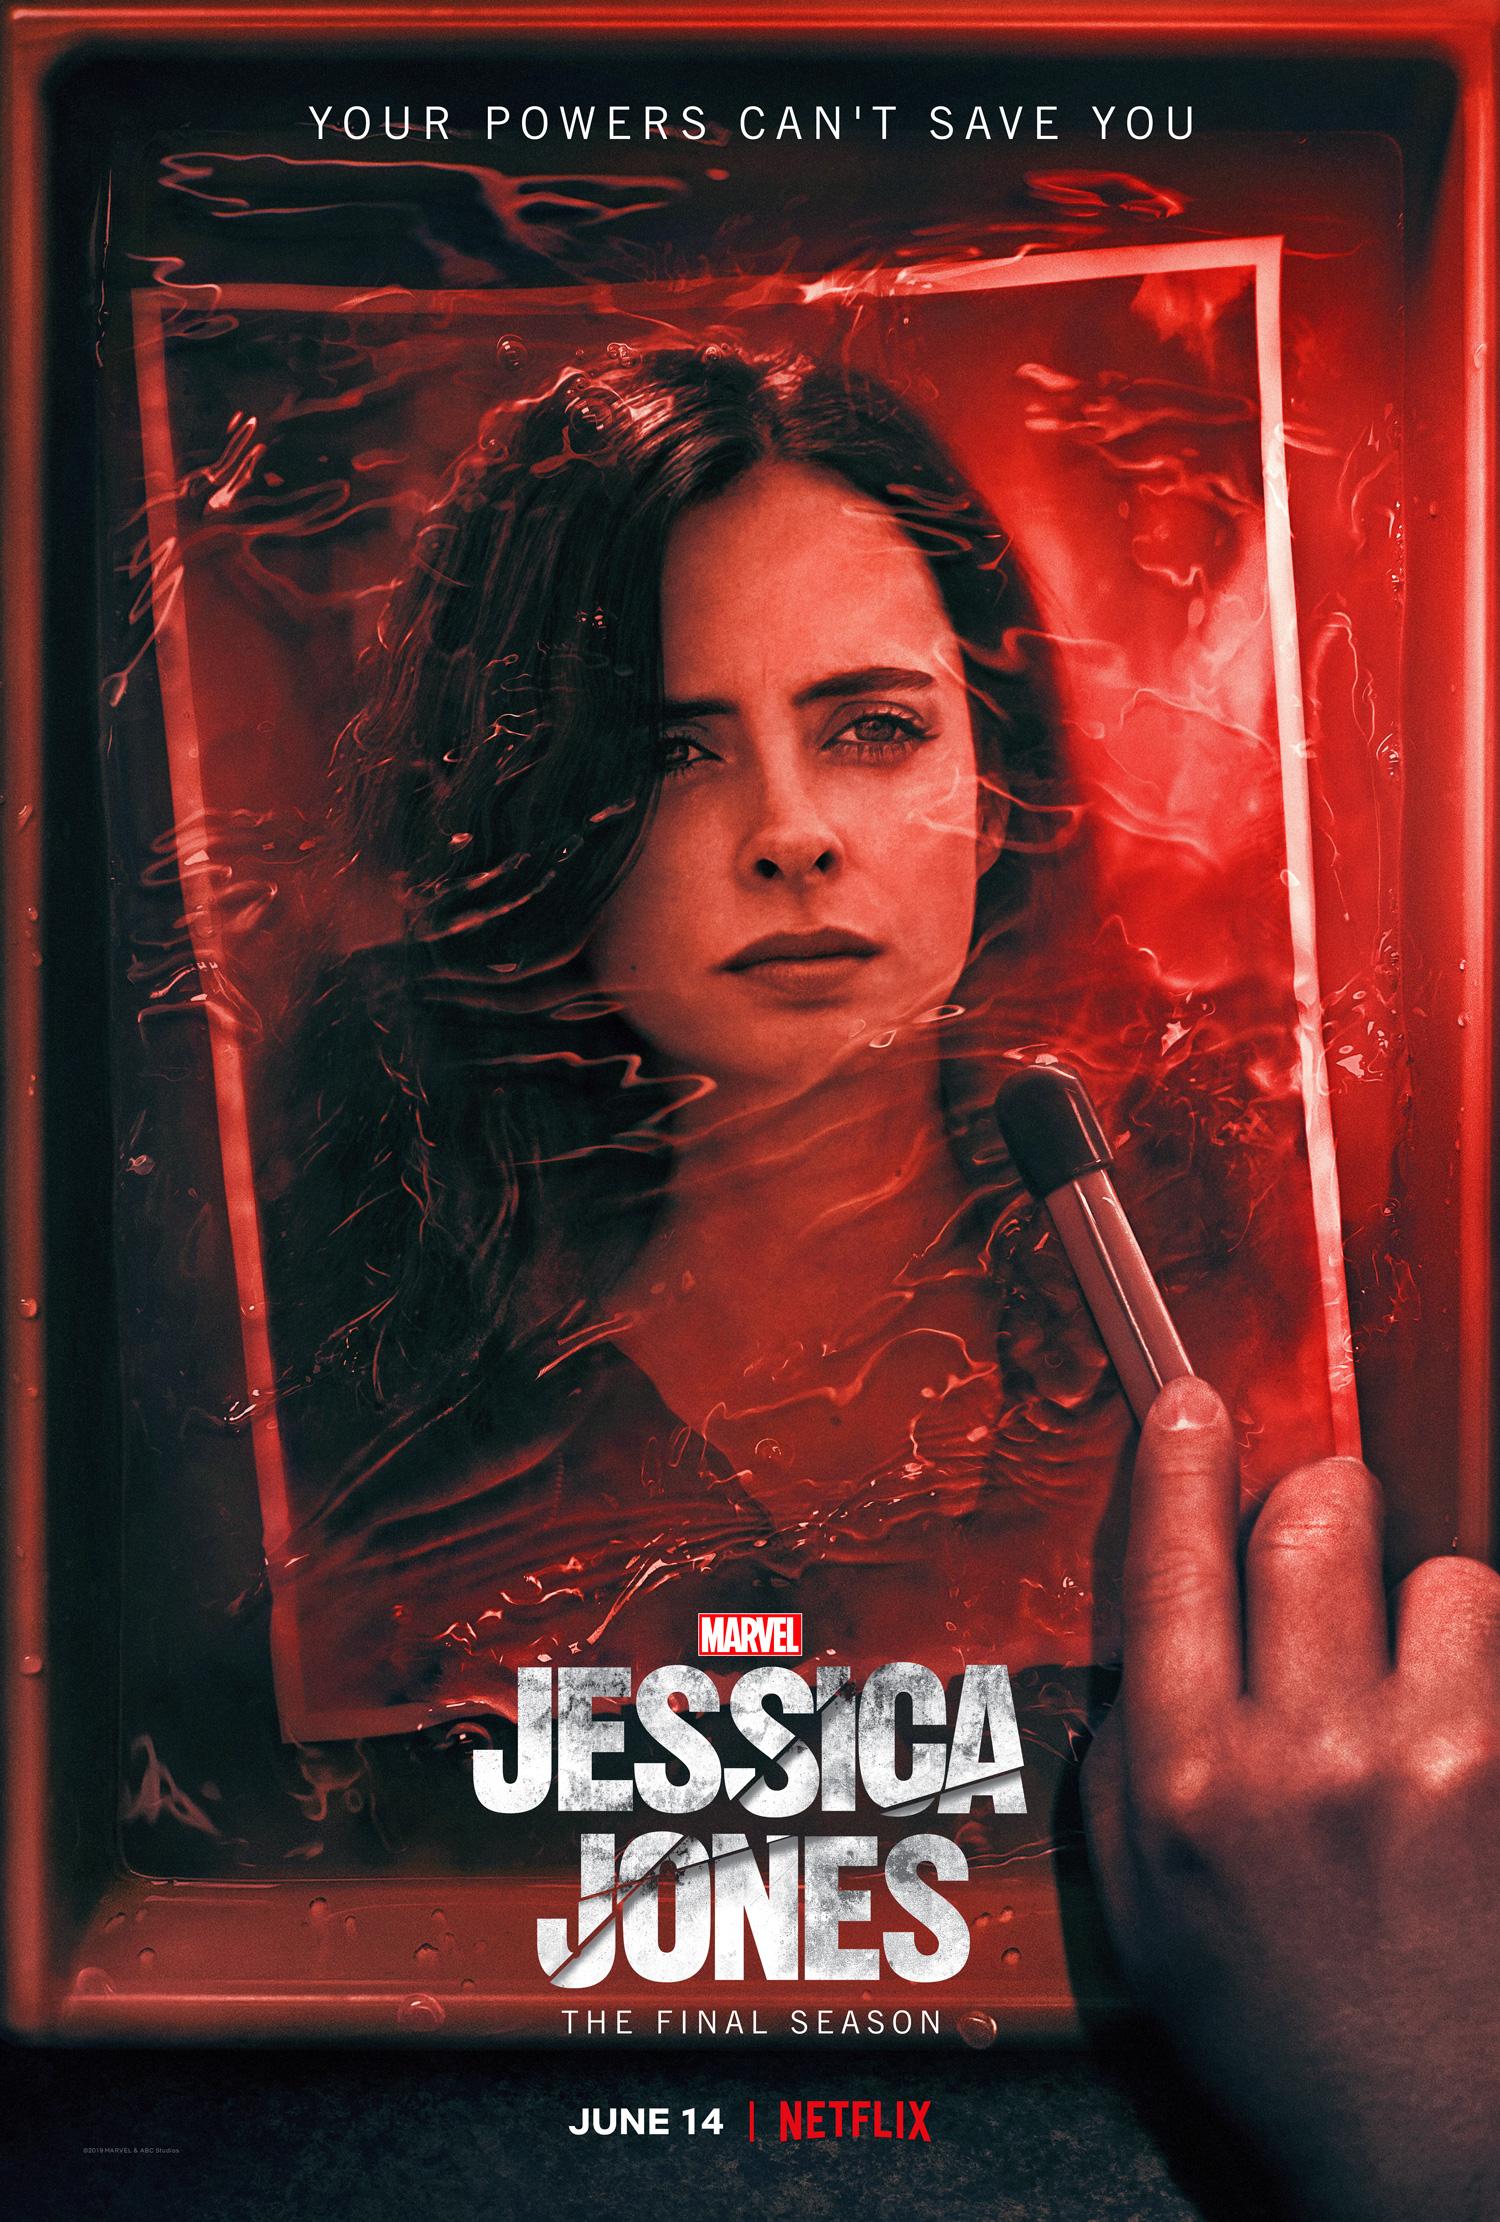 Jessica Jones season 3: trailer and poster tease final episodes